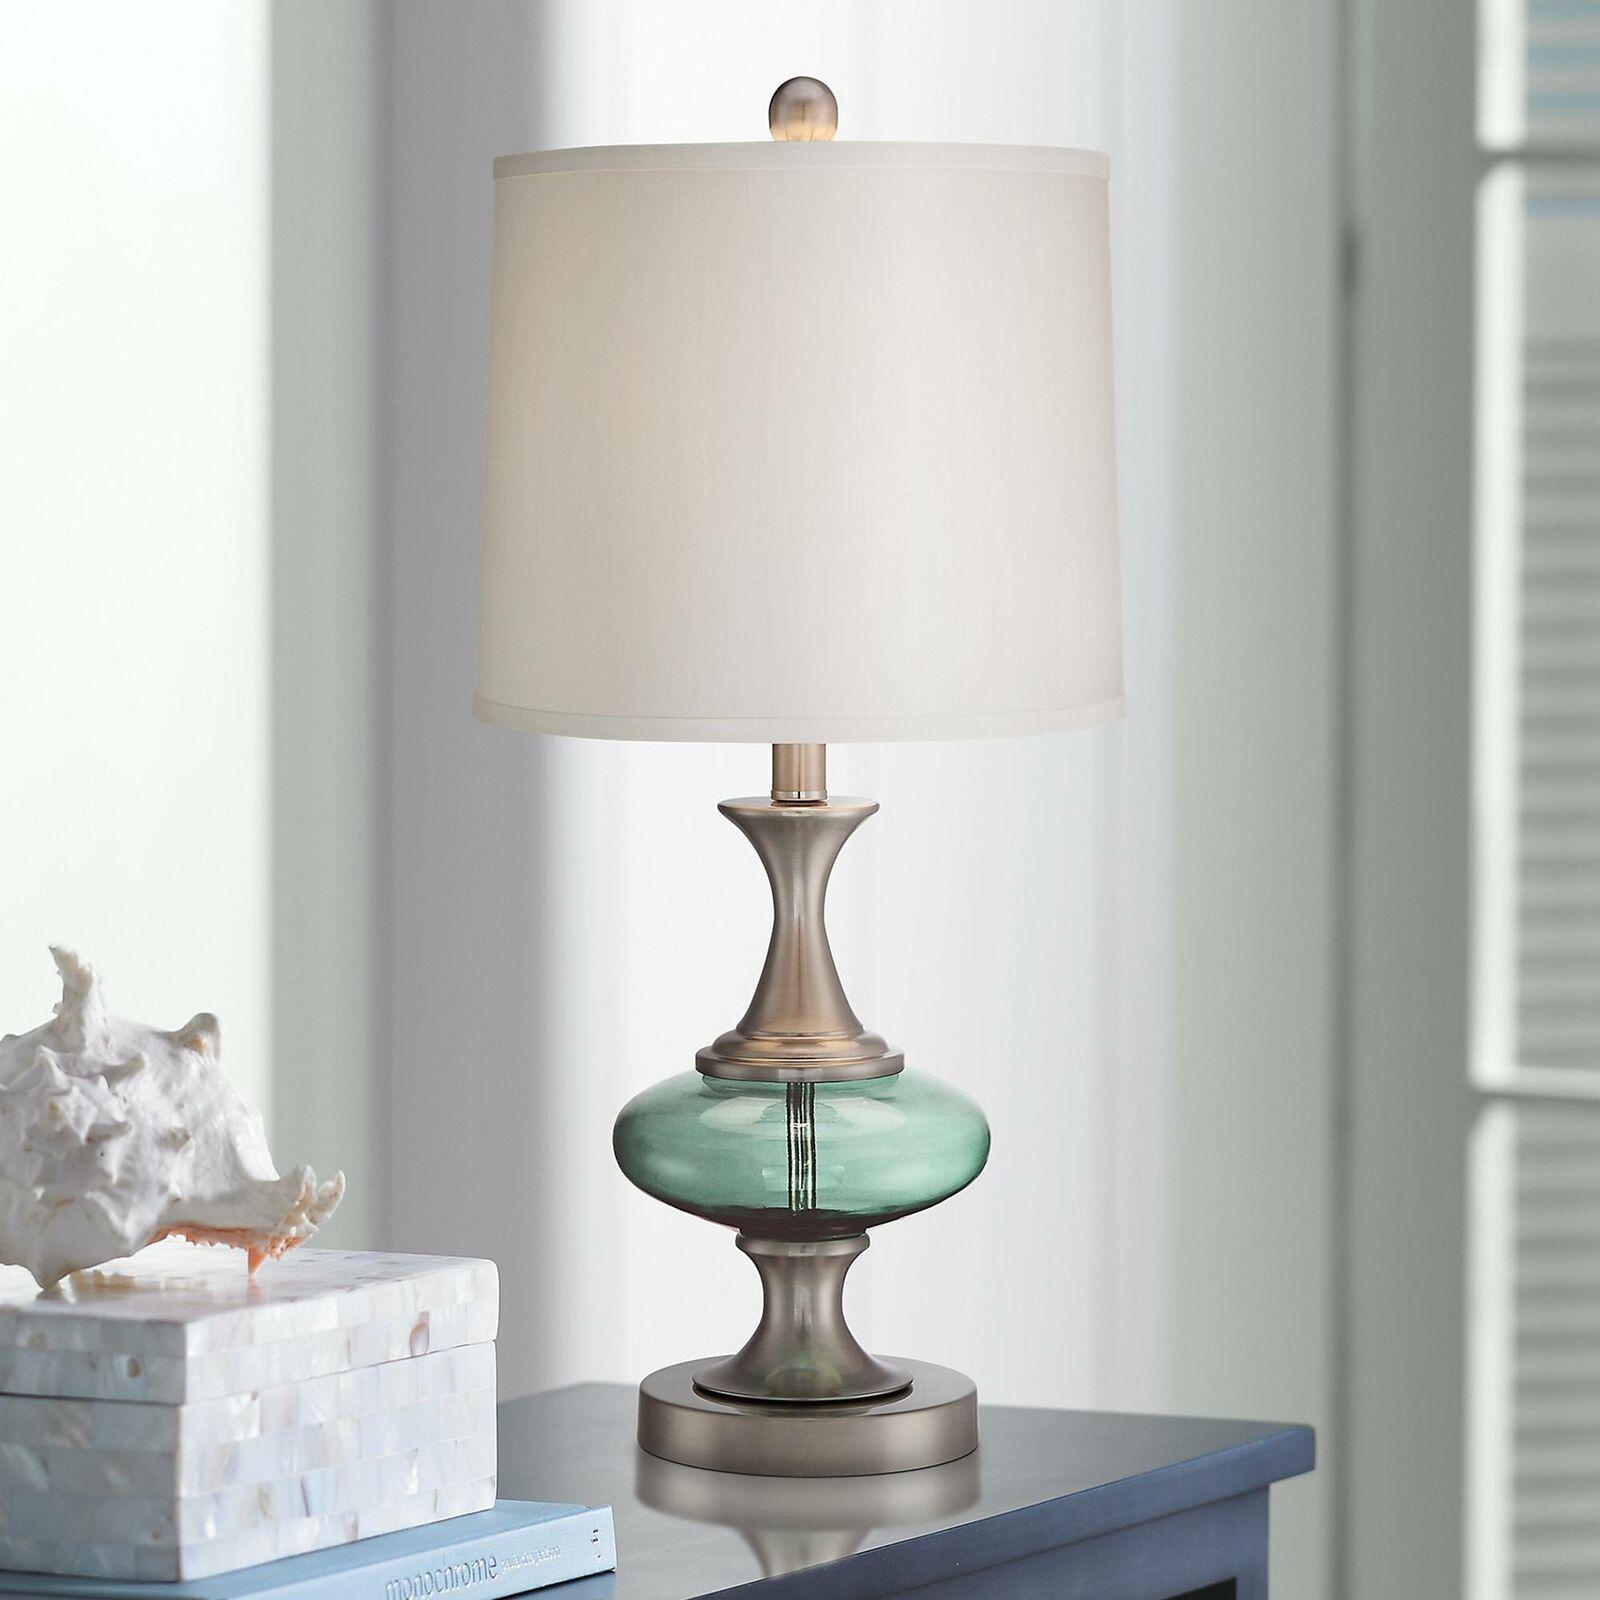 Modern Table Lamp Brushed Steel Blue Green Glass For Living Room Bedroom For Sale Online